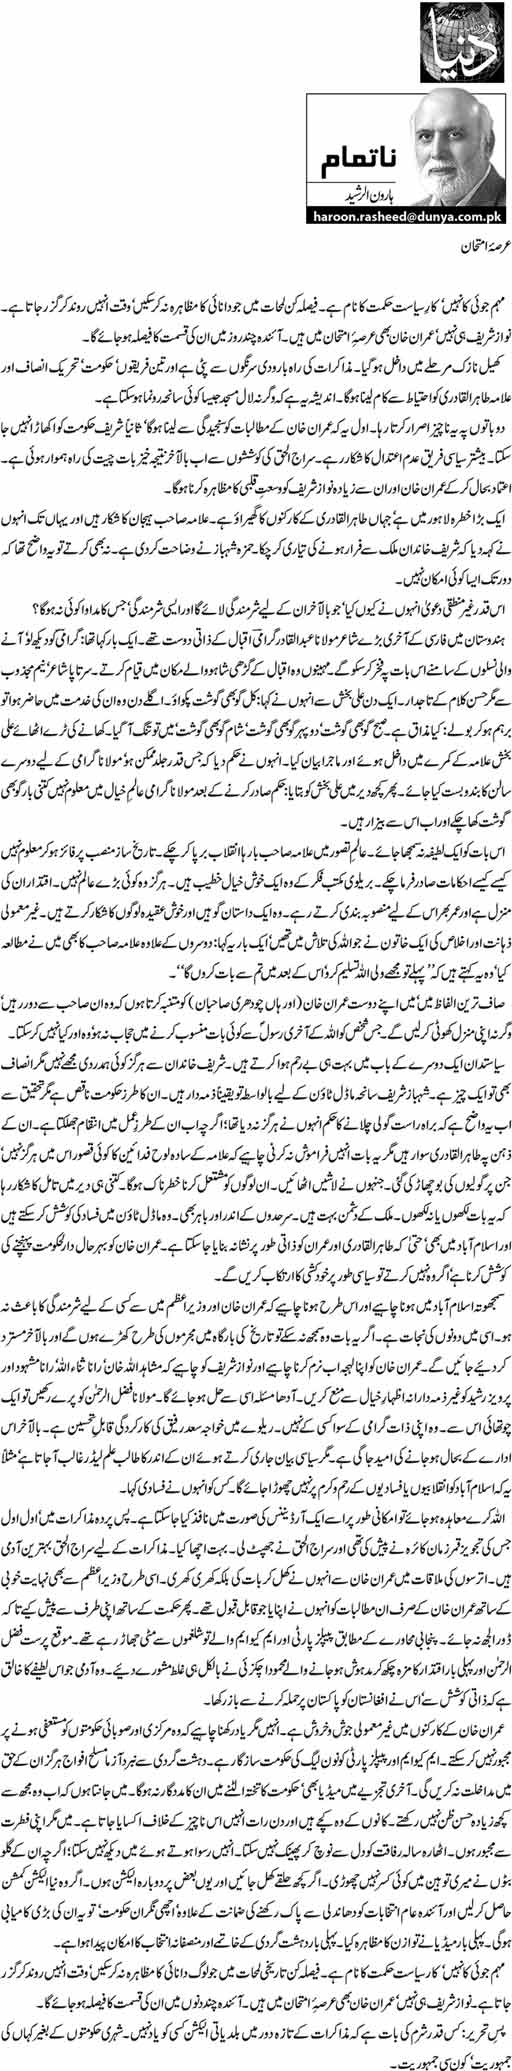 Arsa e Imtihan - Haroon ur Rasheed